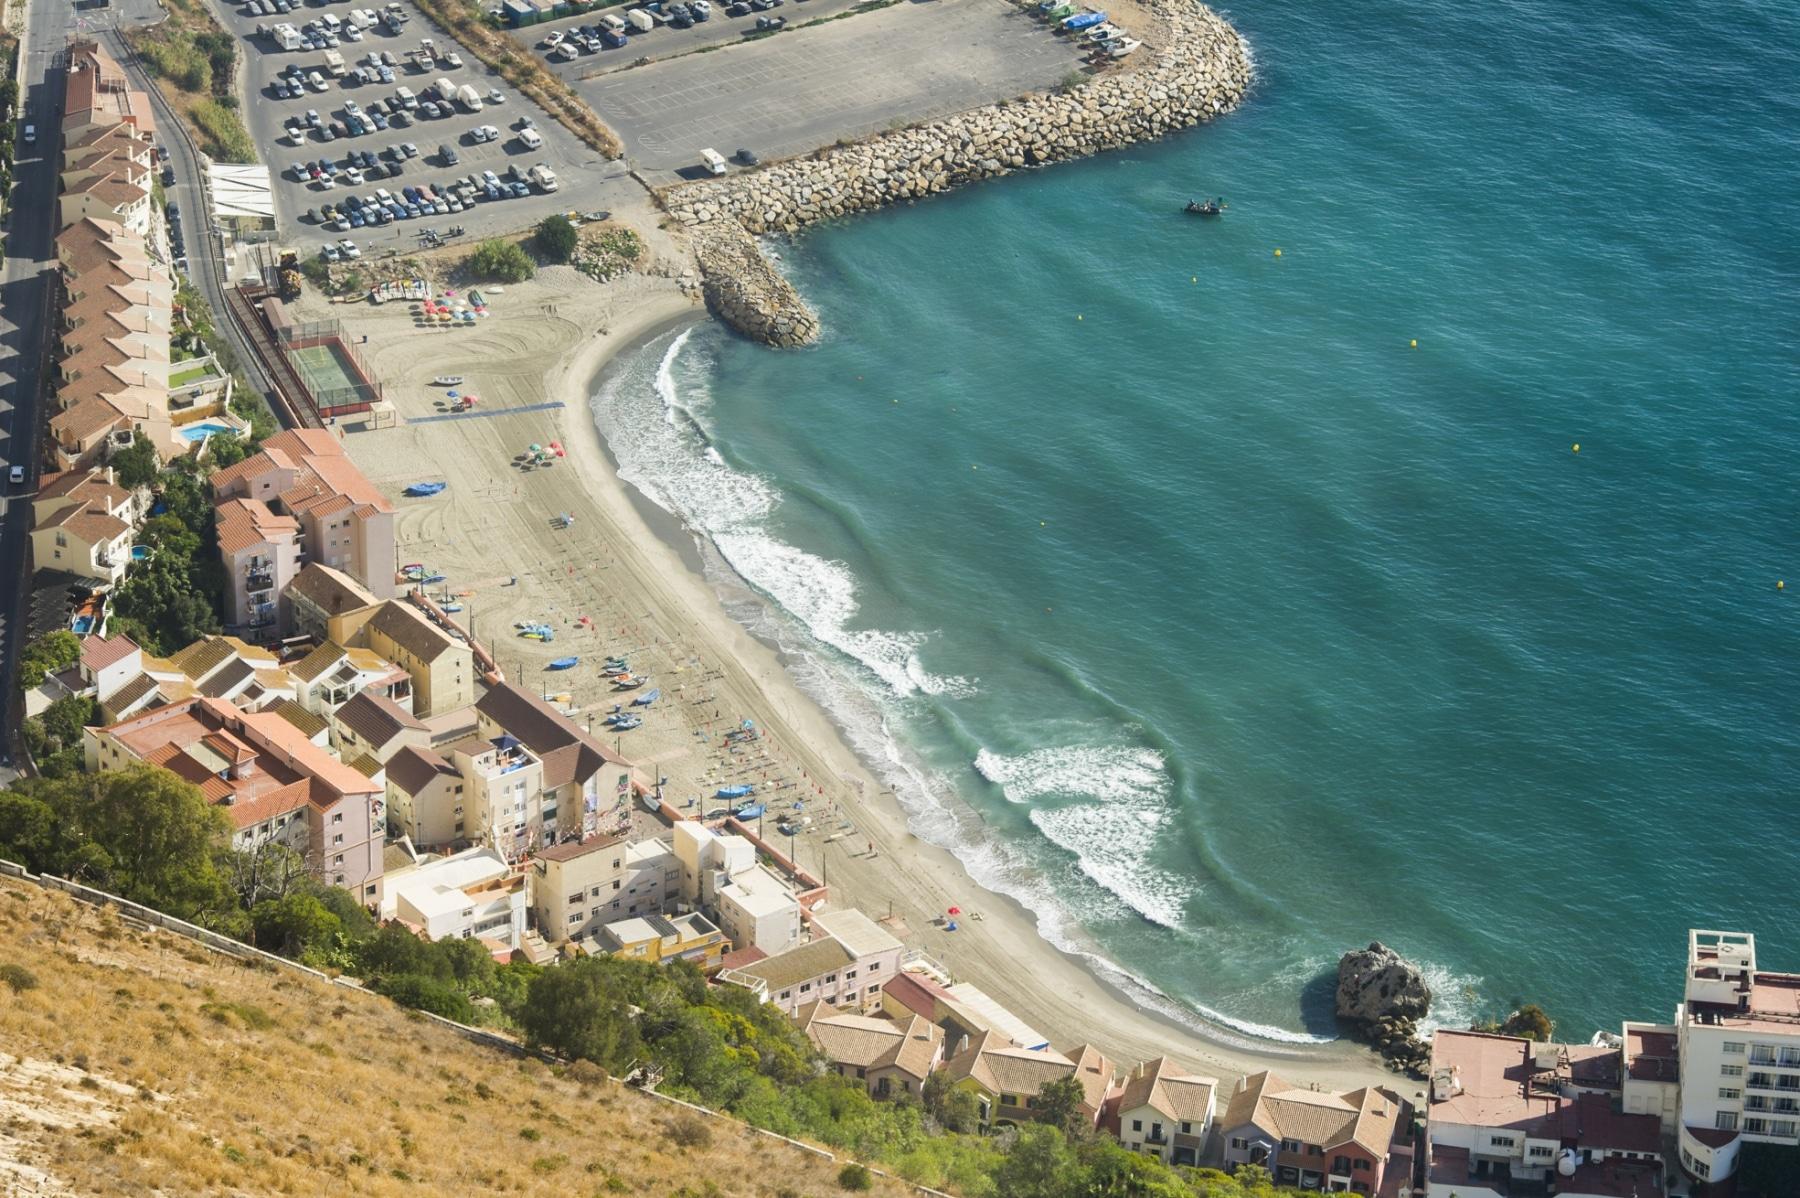 la-playa-de-la-caleta-de-gibraltar_22713252246_o